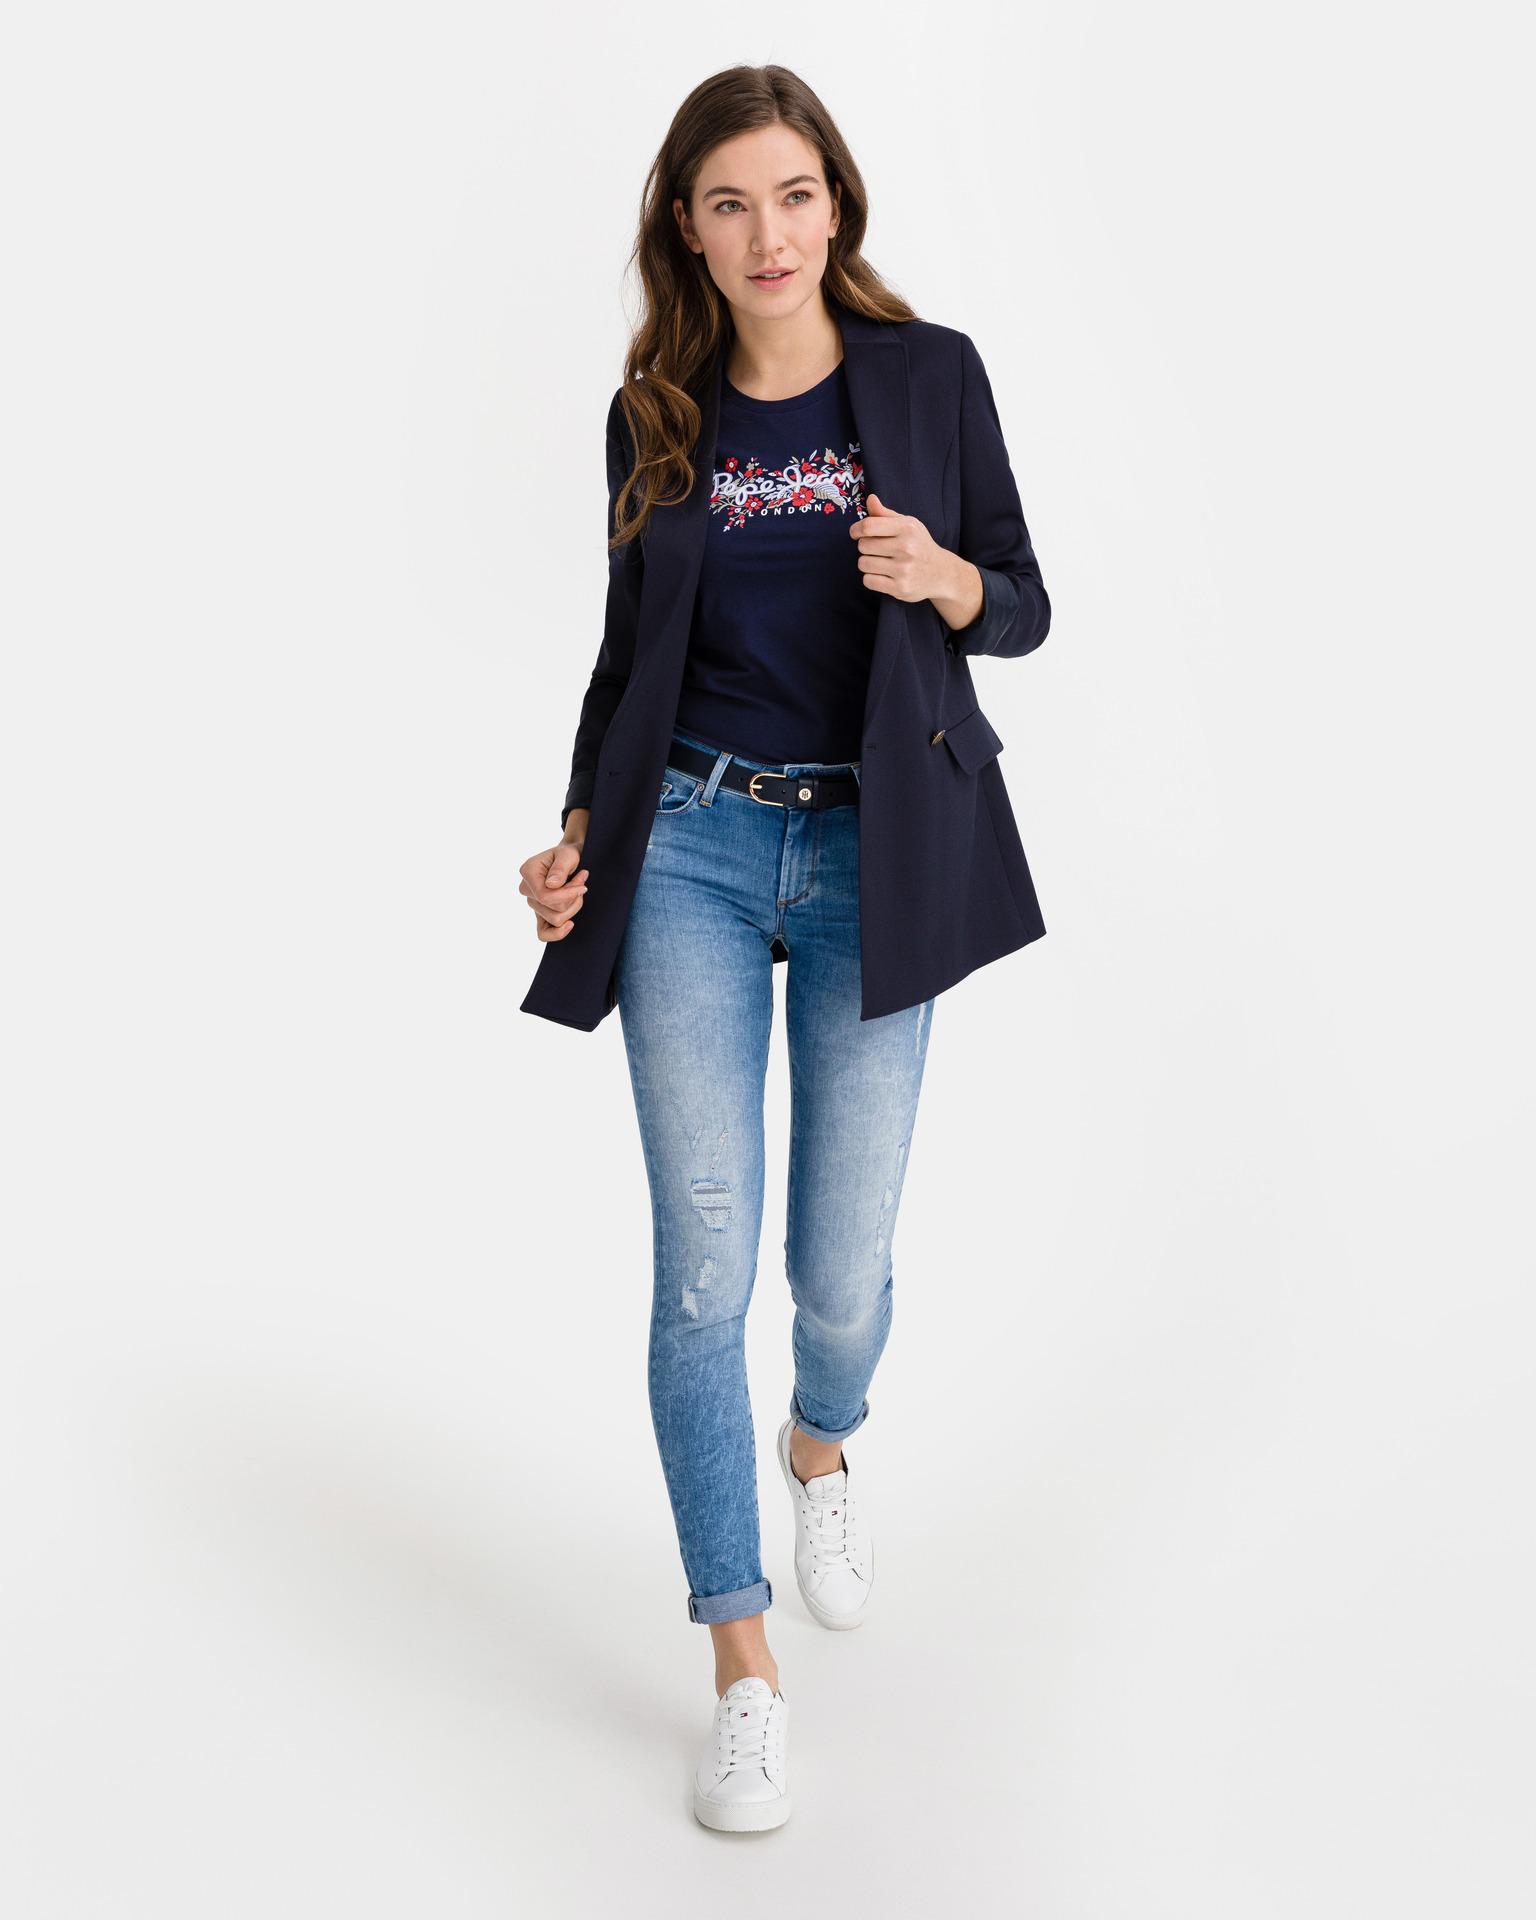 Pepe Jeans Maglietta donna blu Triko